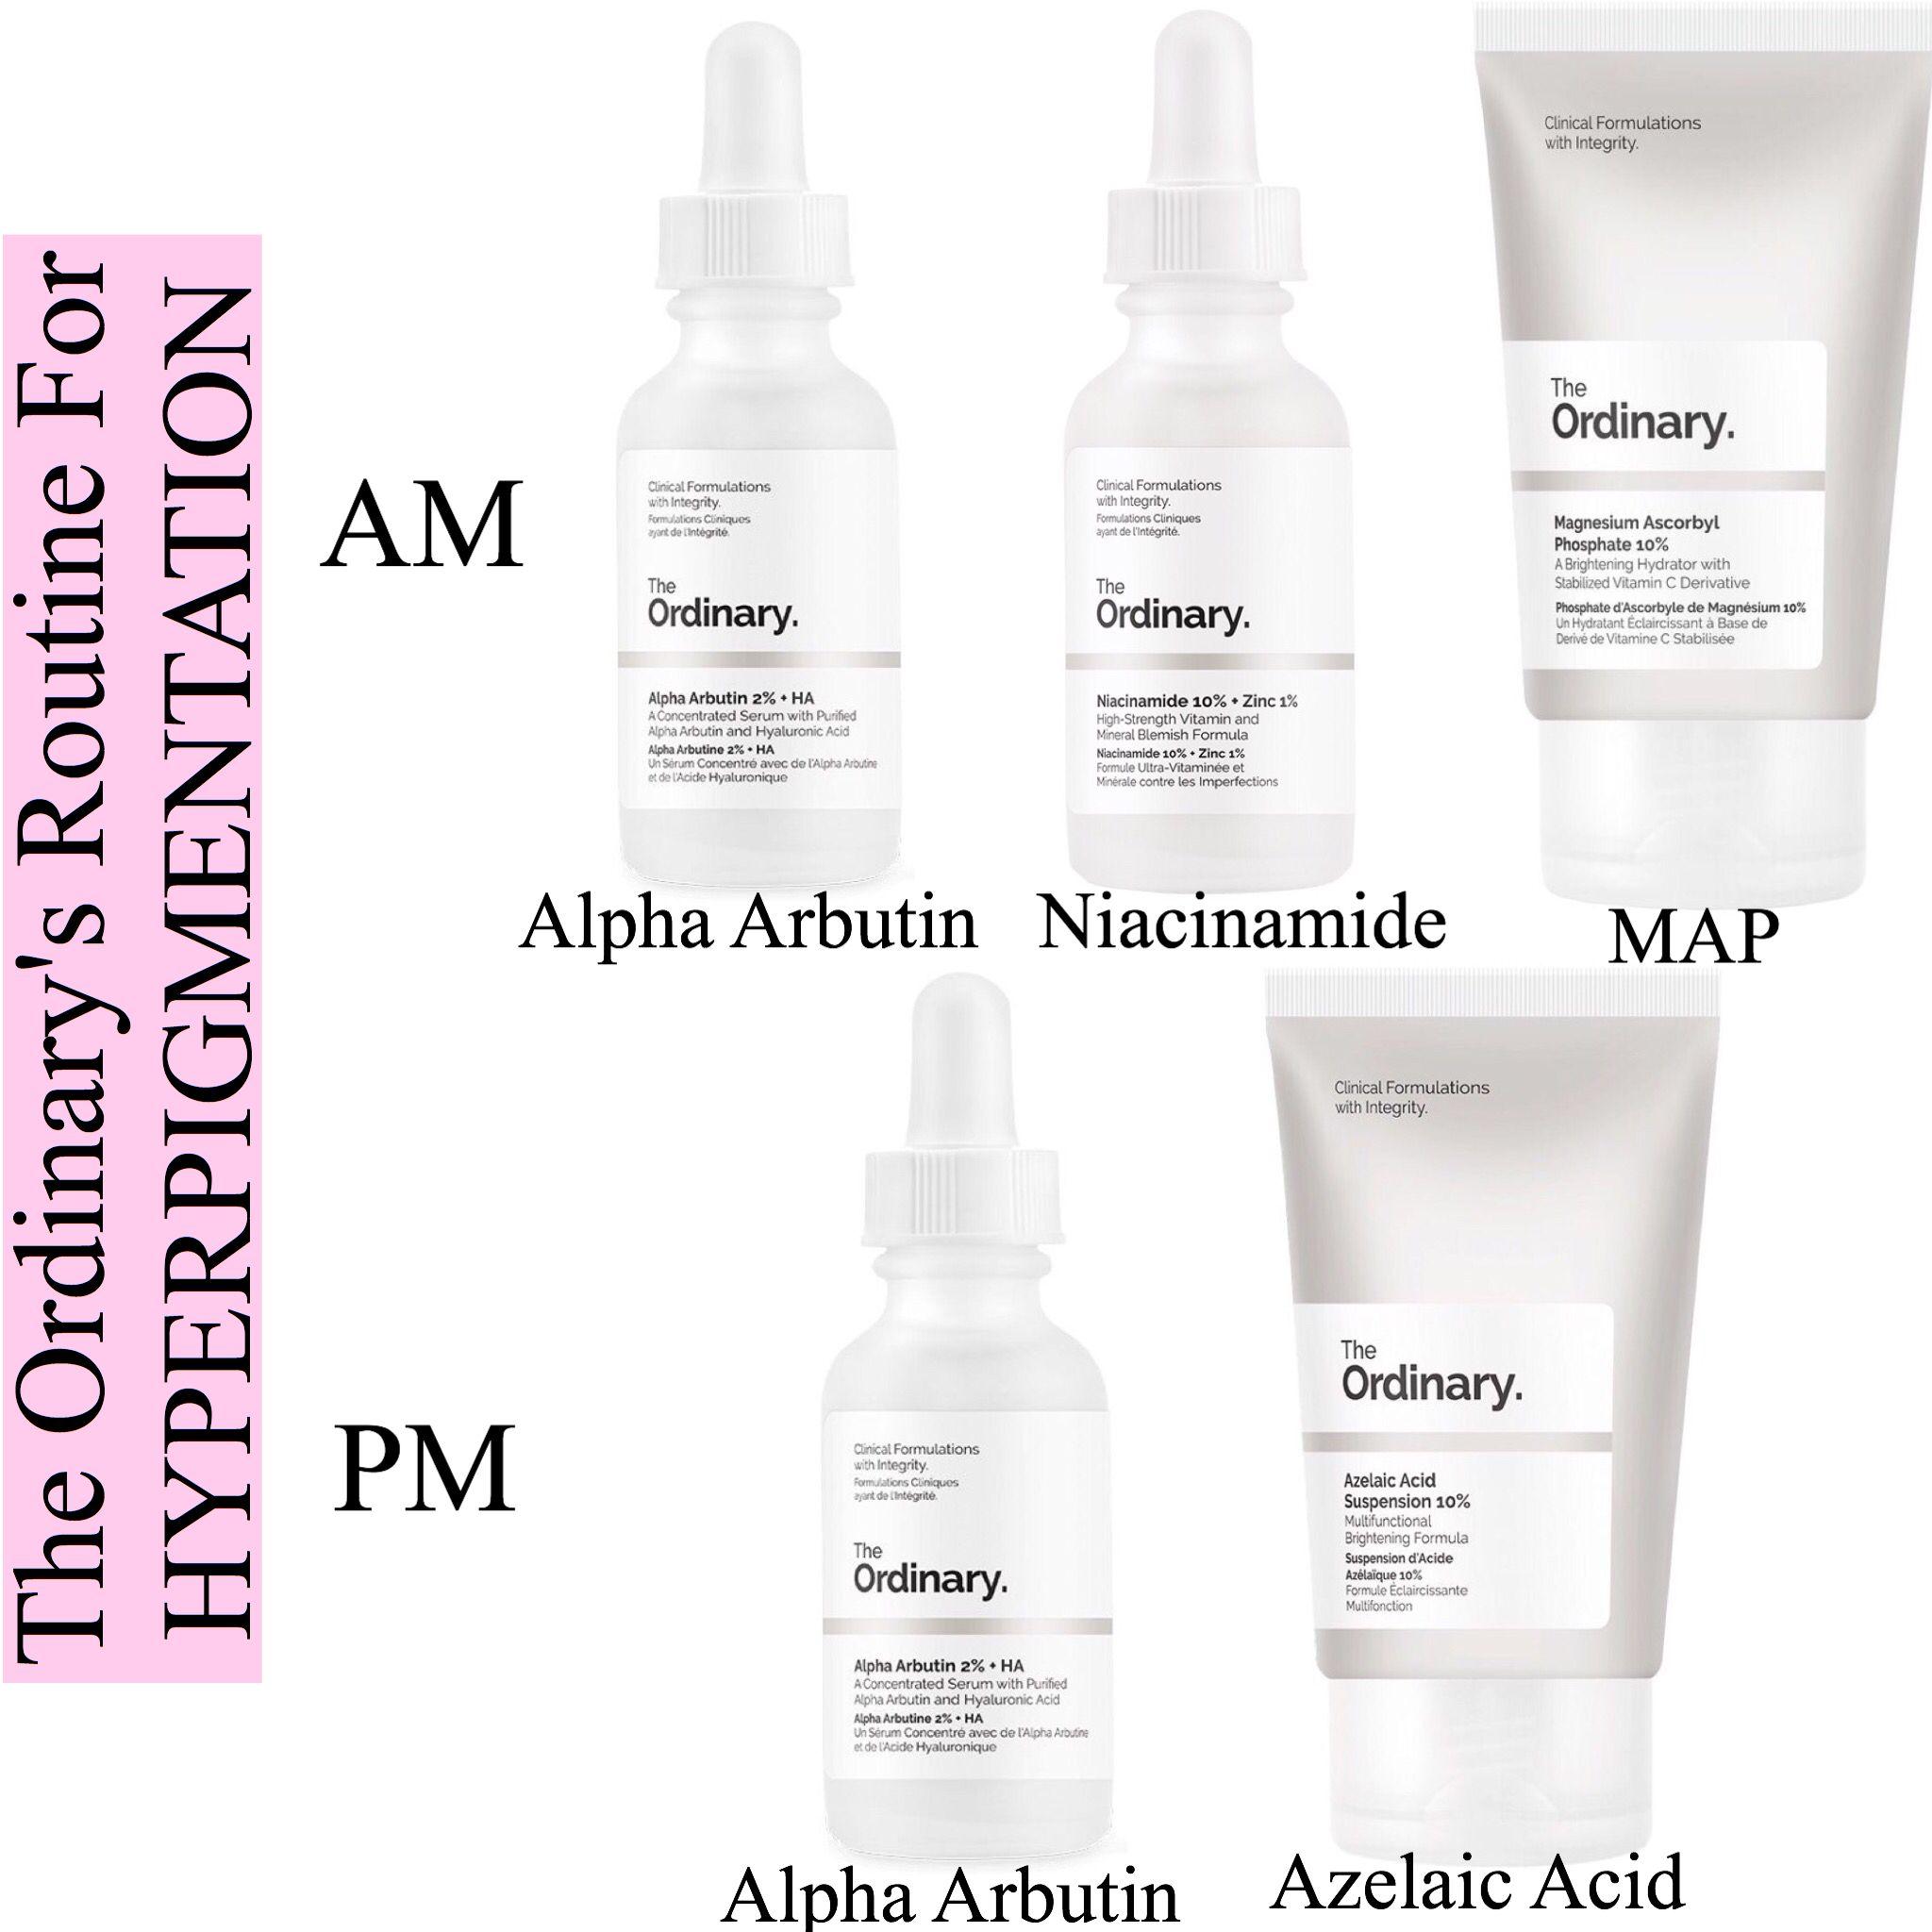 Example regimen for pigmentation issues AM Alpha Arbutin